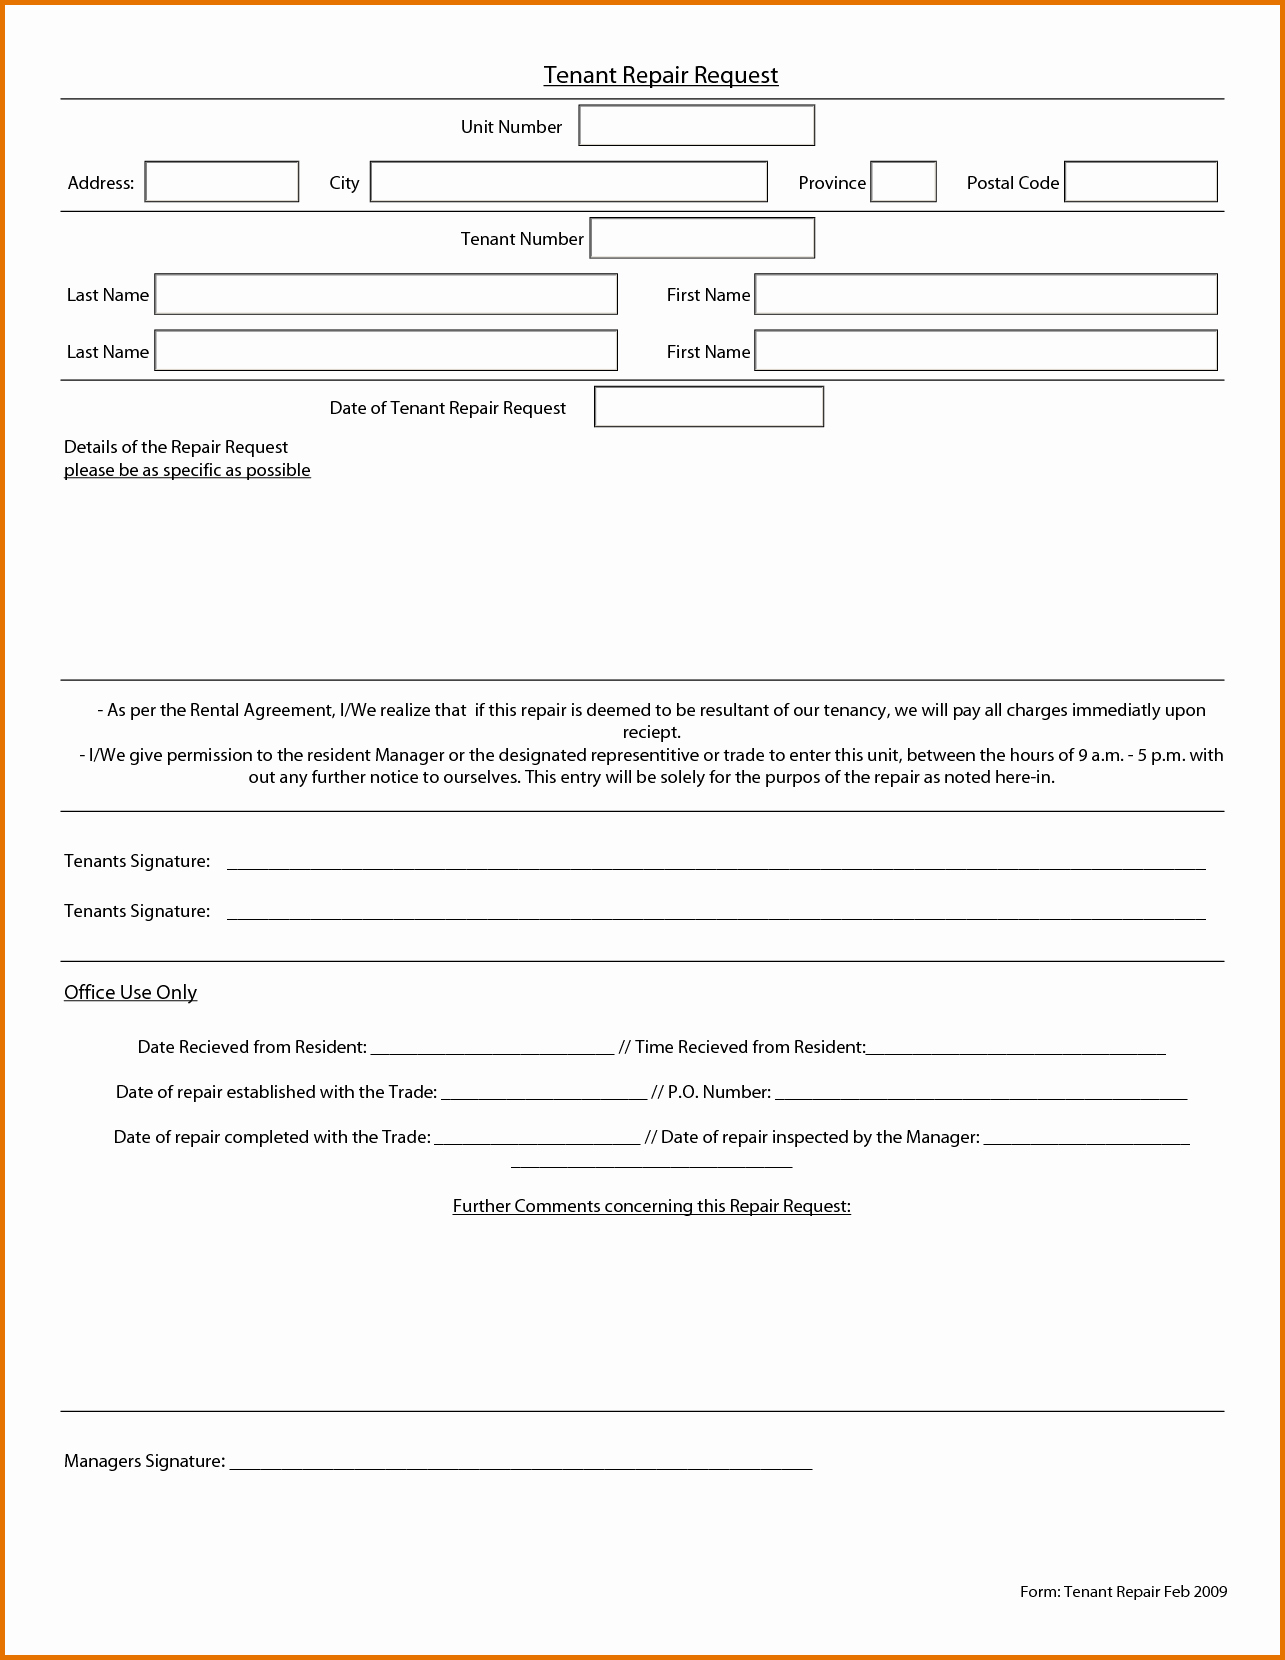 Tenant Maintenance Request form Template Awesome Maintenance Request form Template